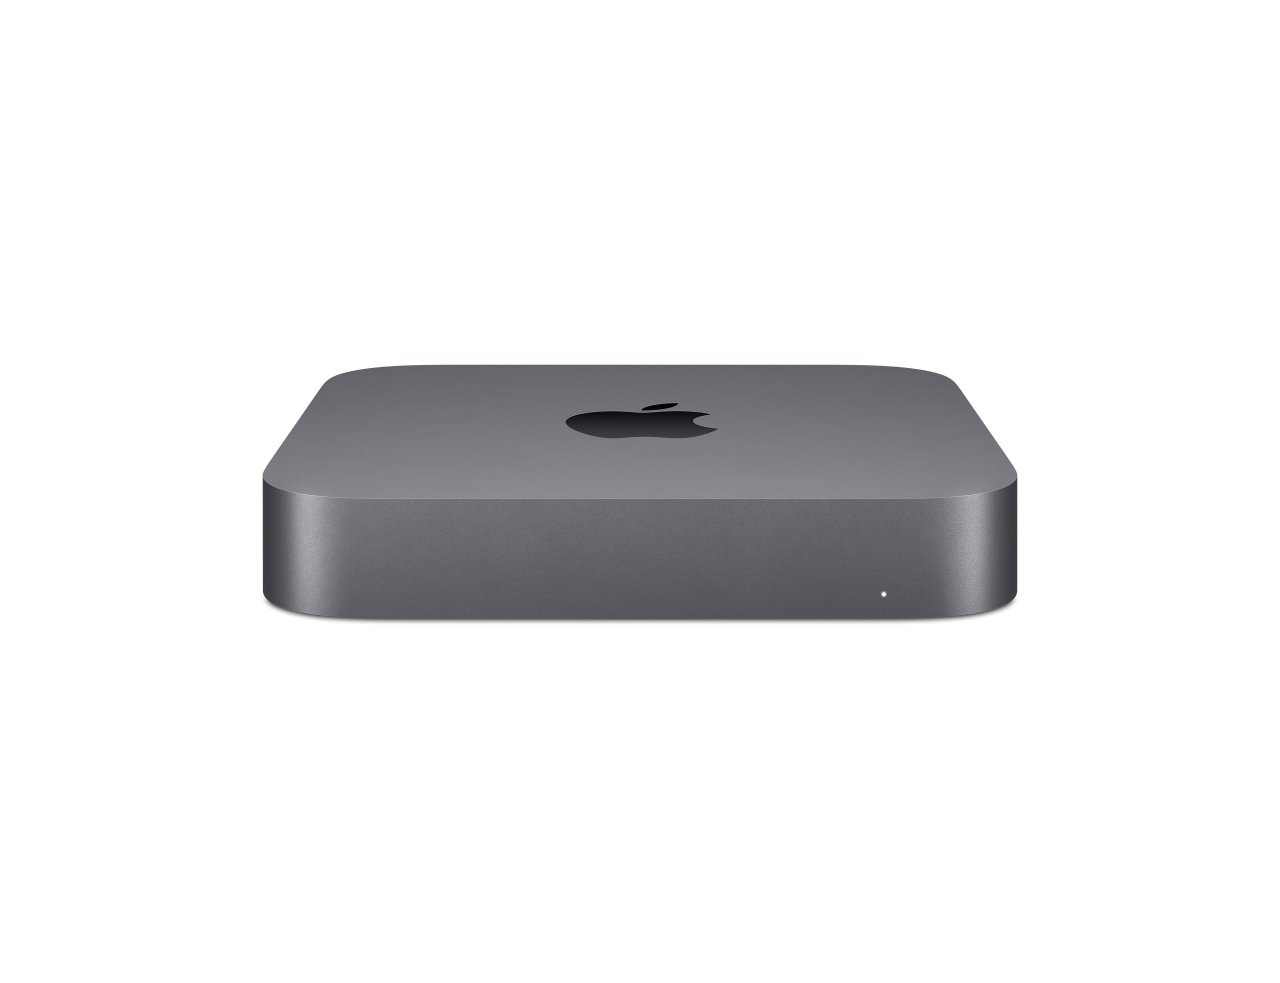 Apple Mac mini 3.0 GHz 6-Core Intel Core i5 NEU konfigurierbar